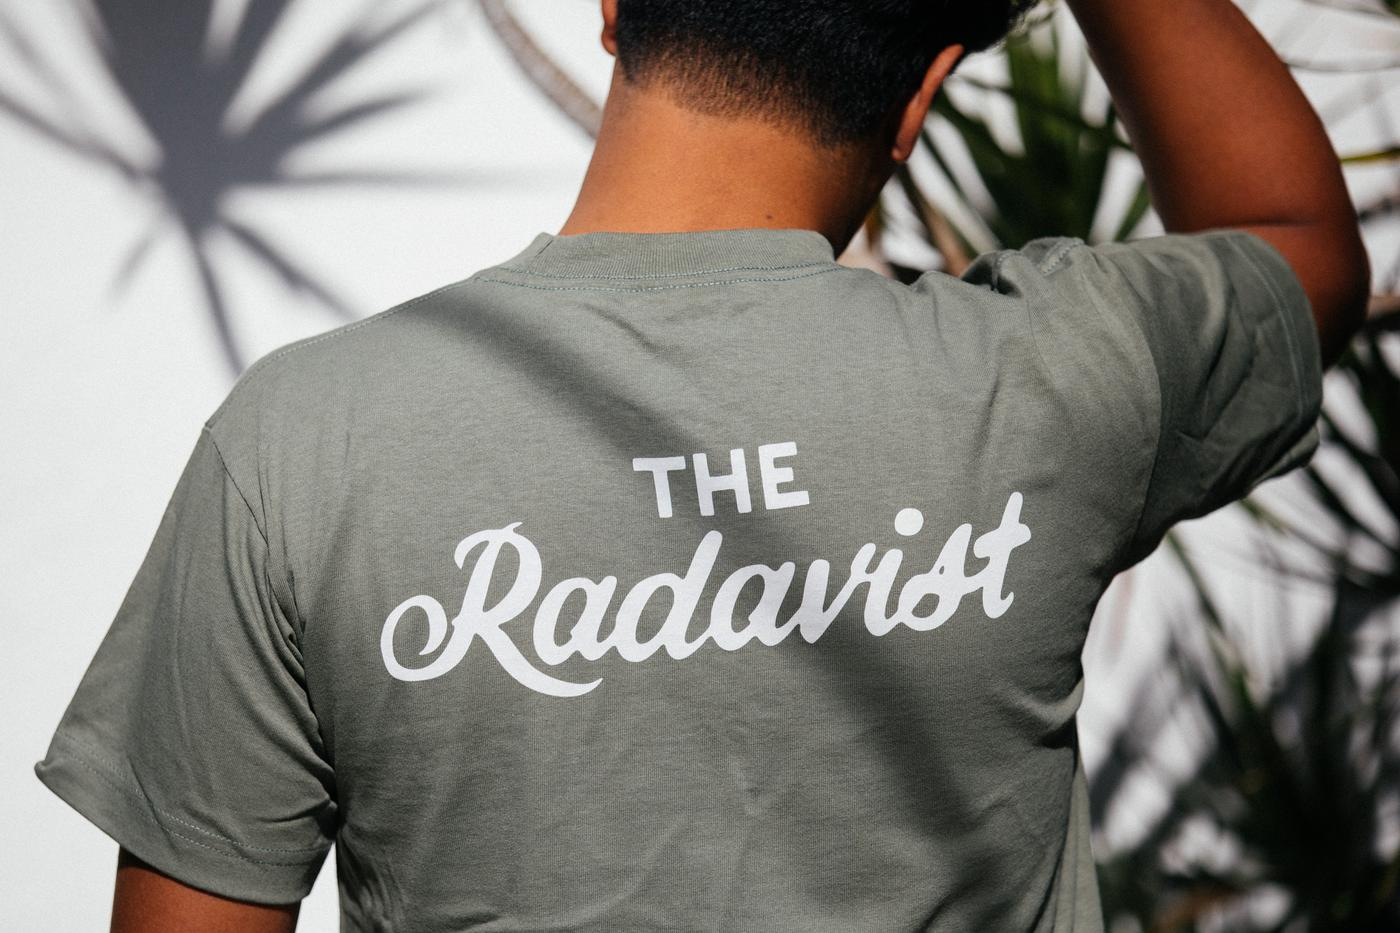 More Radavist T-Shirts in Stock!